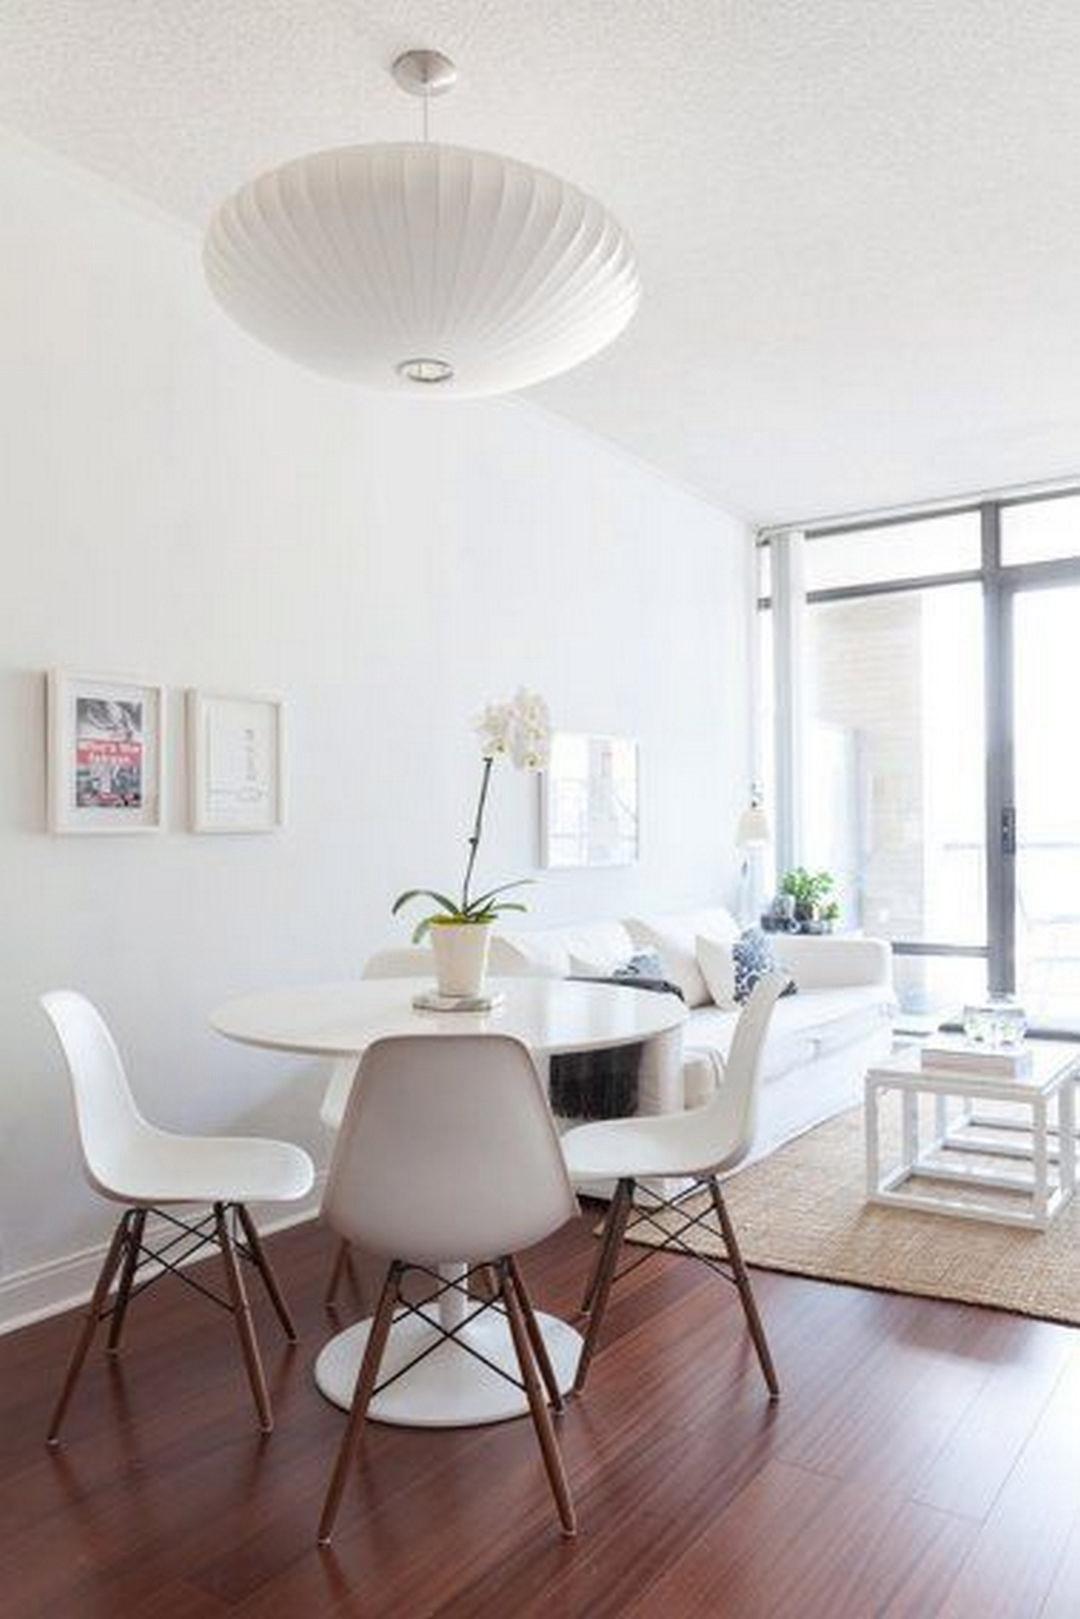 Photo of 16 Delicious Ideas for Dining Room Furniture | Futurist Architecture